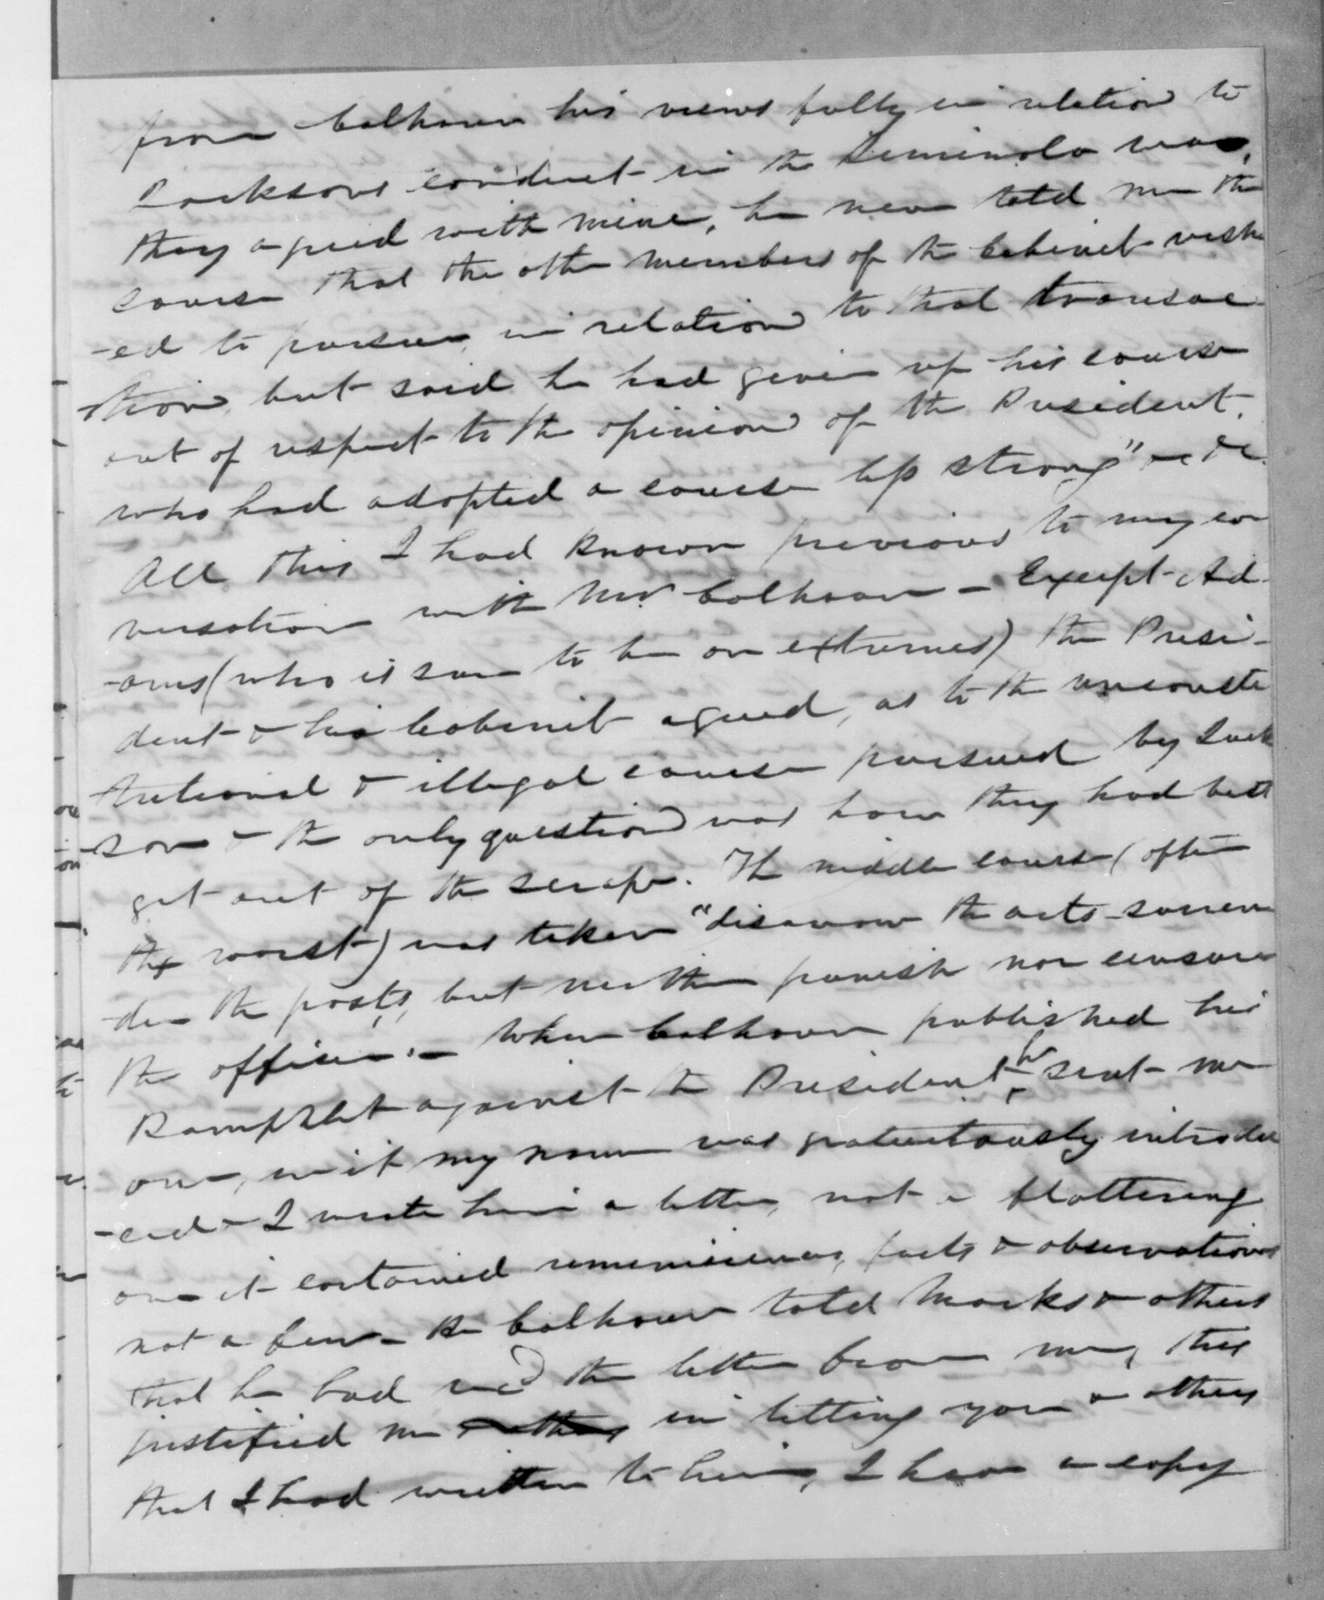 Abner Lacock to Henry Baldwin, February 18, 1832